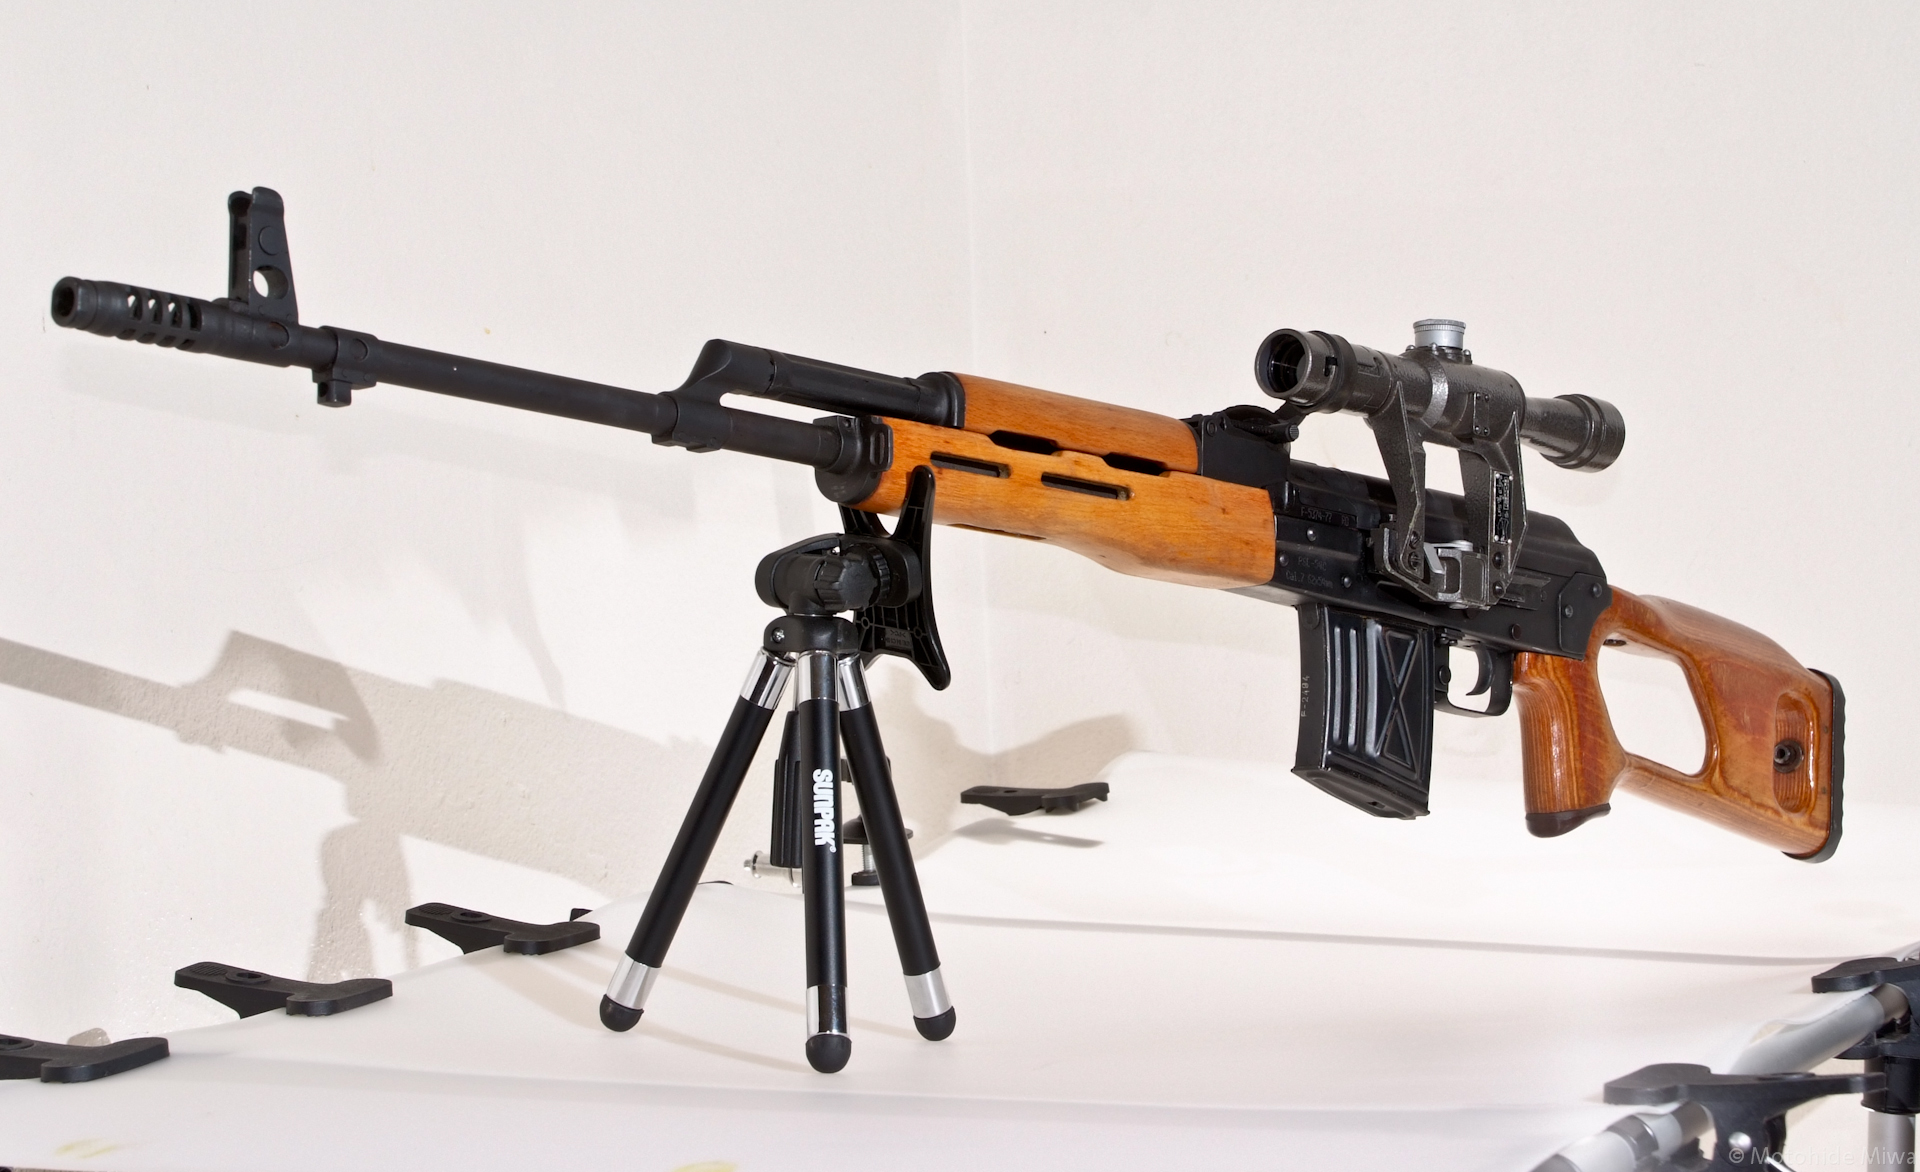 File:PSL Dragunov 7 62 mm Sniper Rifle - (2) jpg - Wikimedia